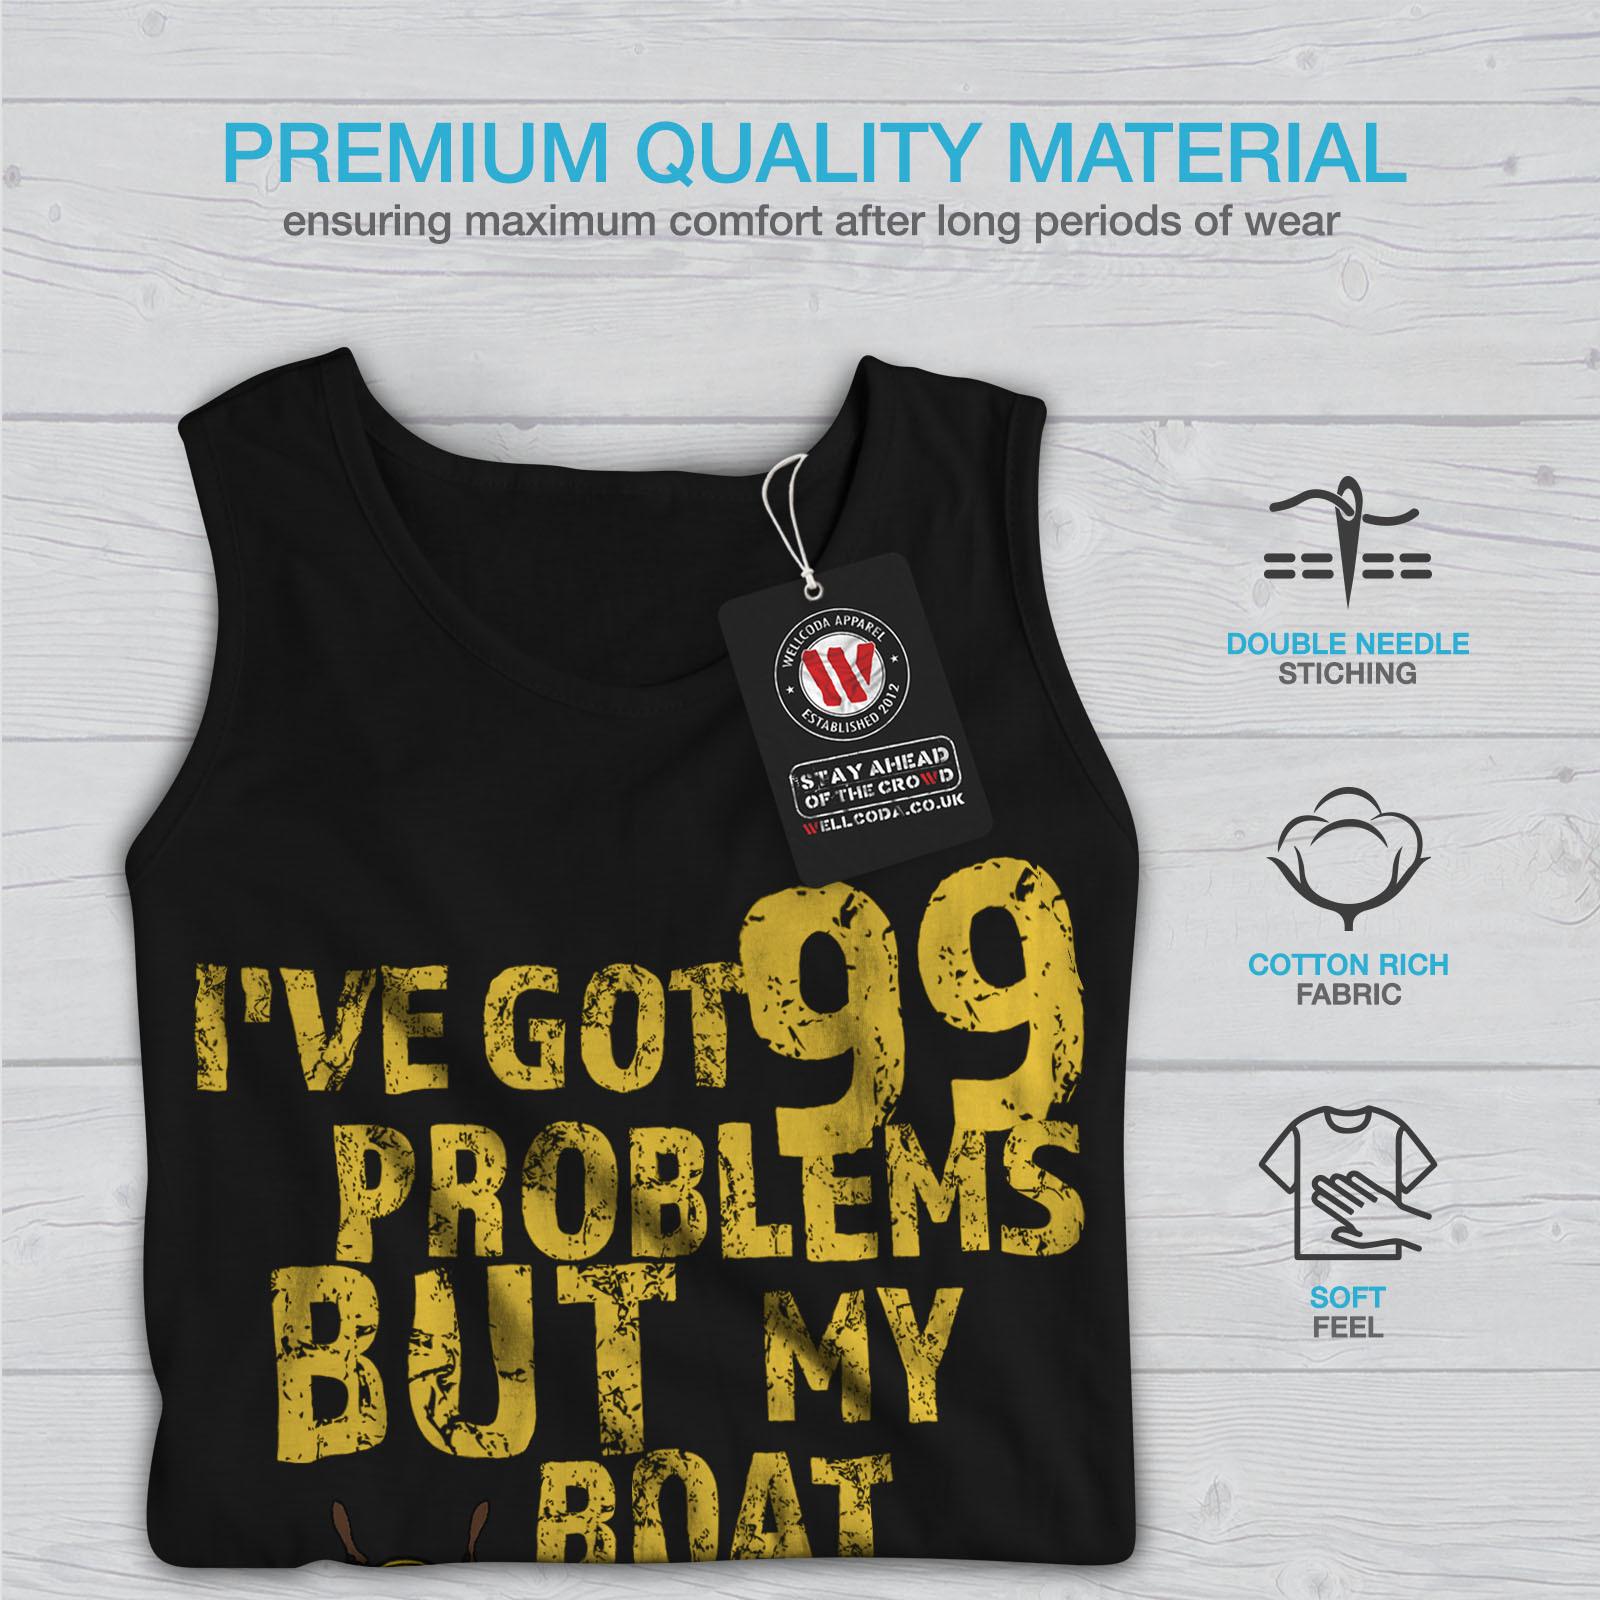 99 Problems Boat Tee Sailor Women Tank Top